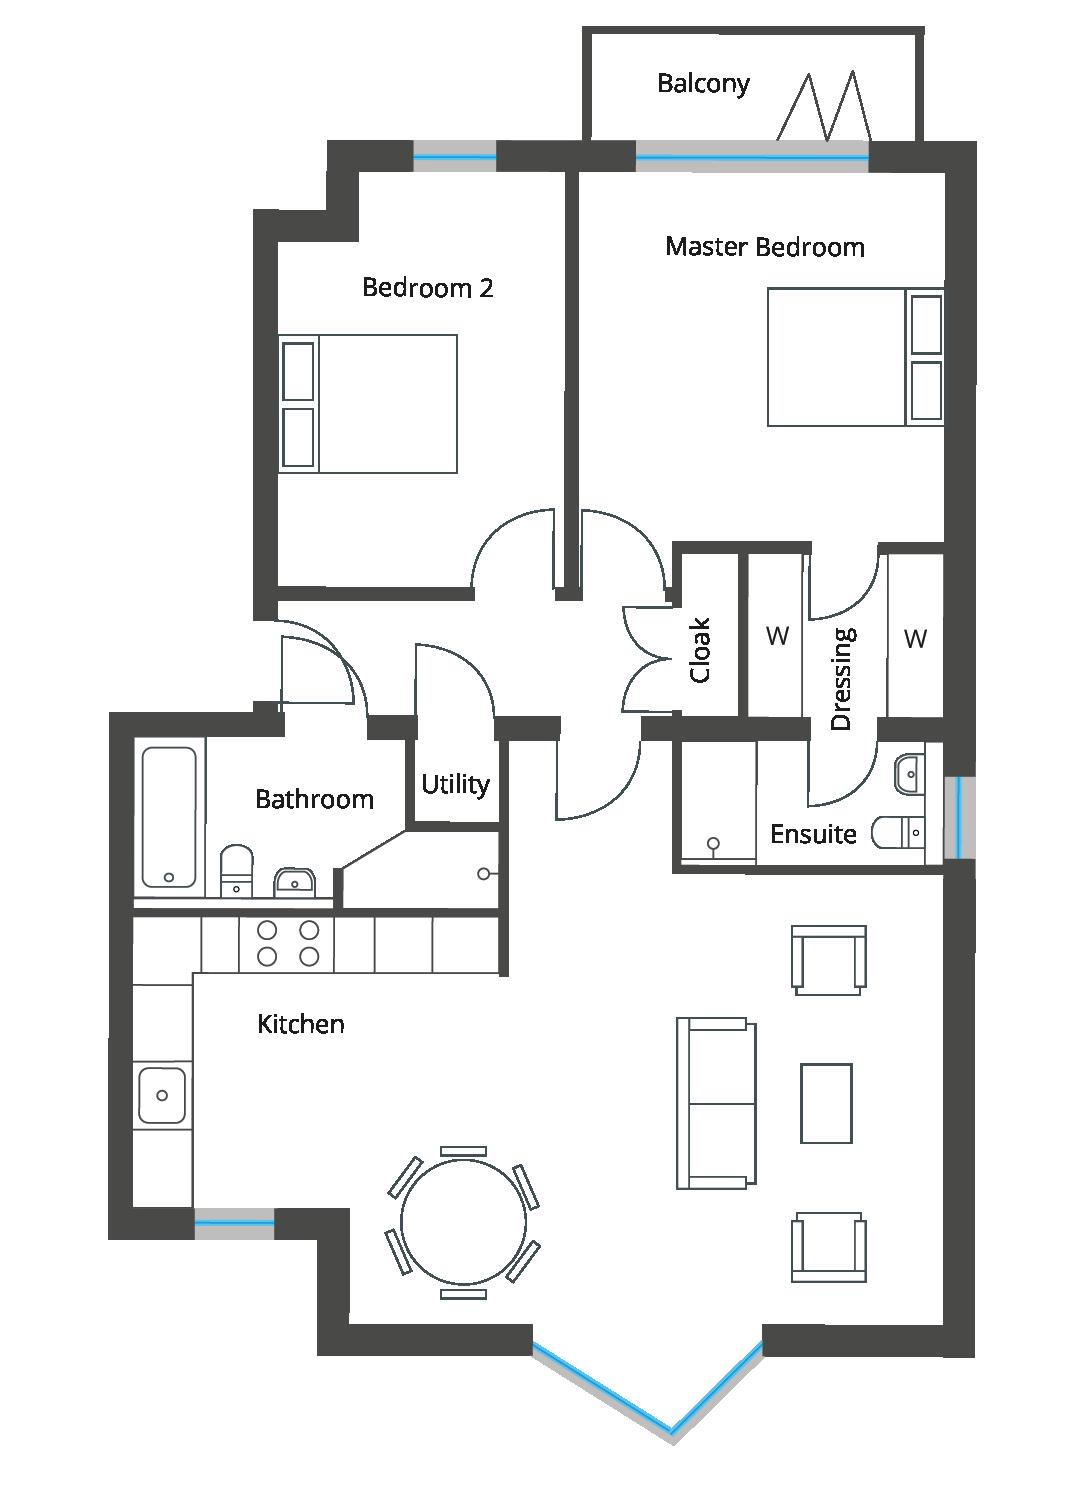 Floorplan for Apartment 3